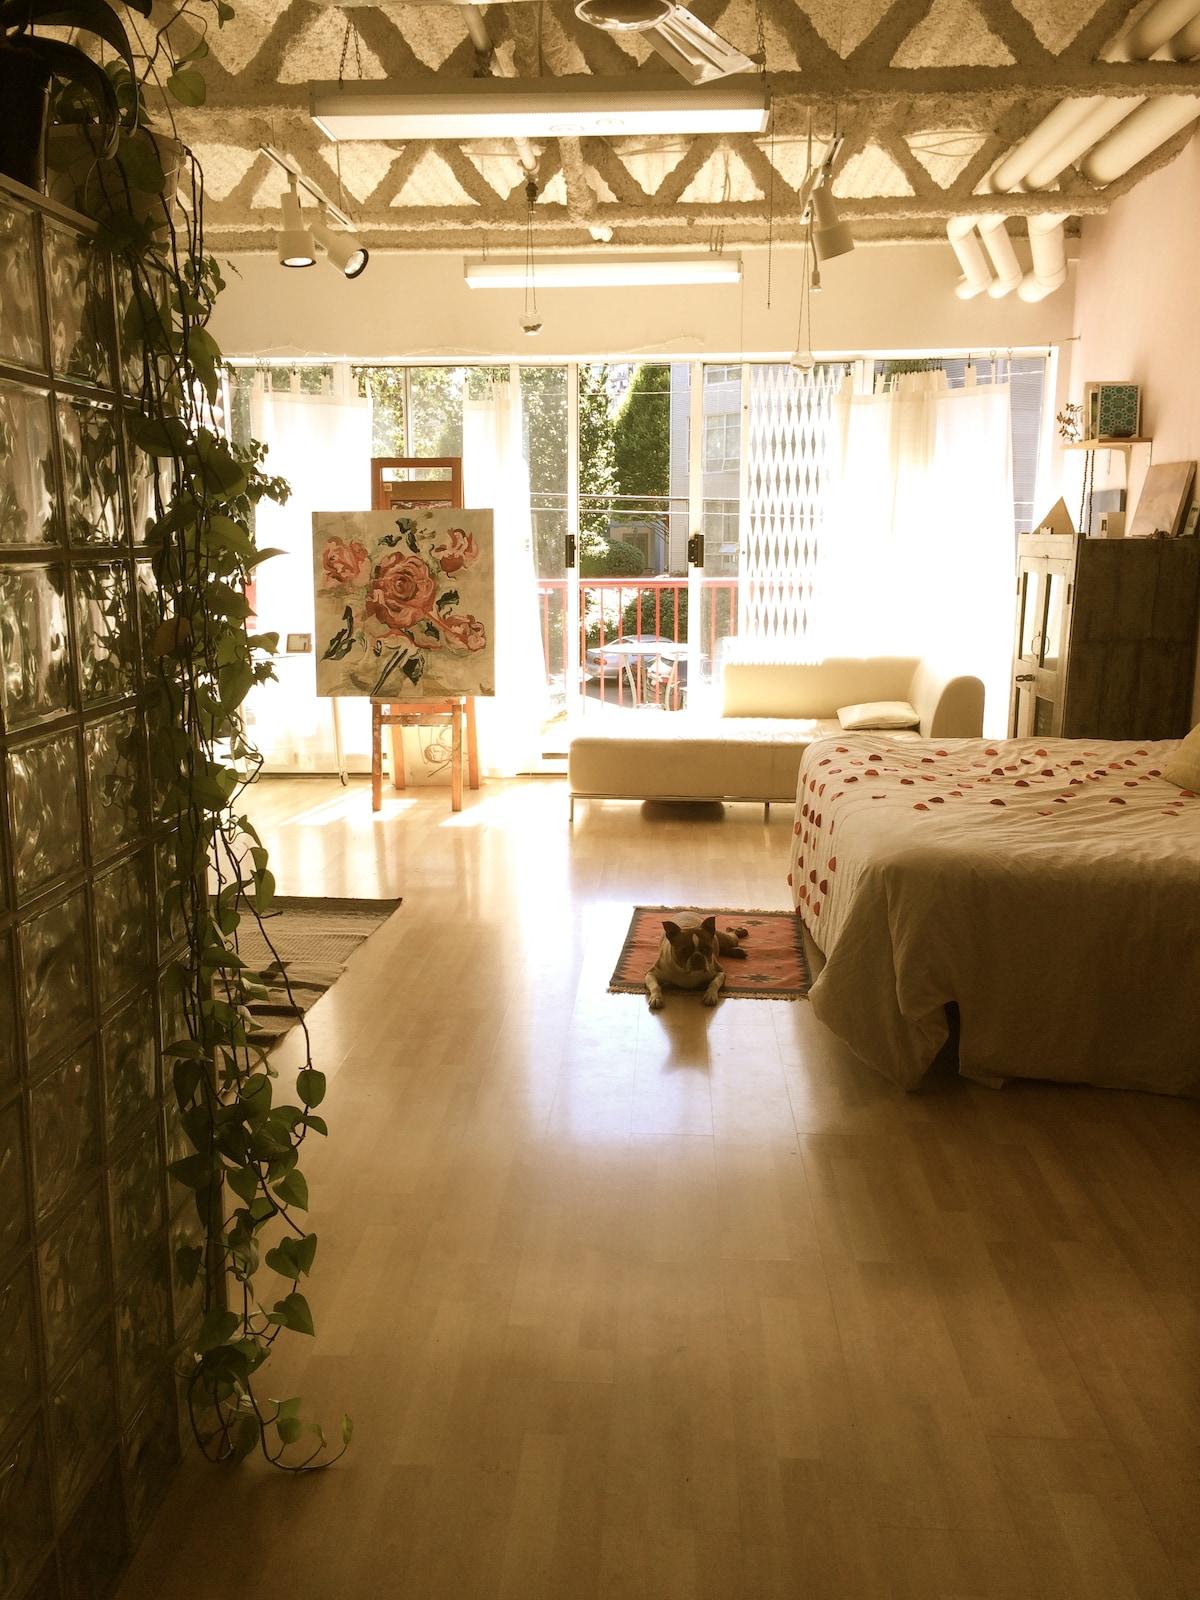 Spacious yoga and art loft